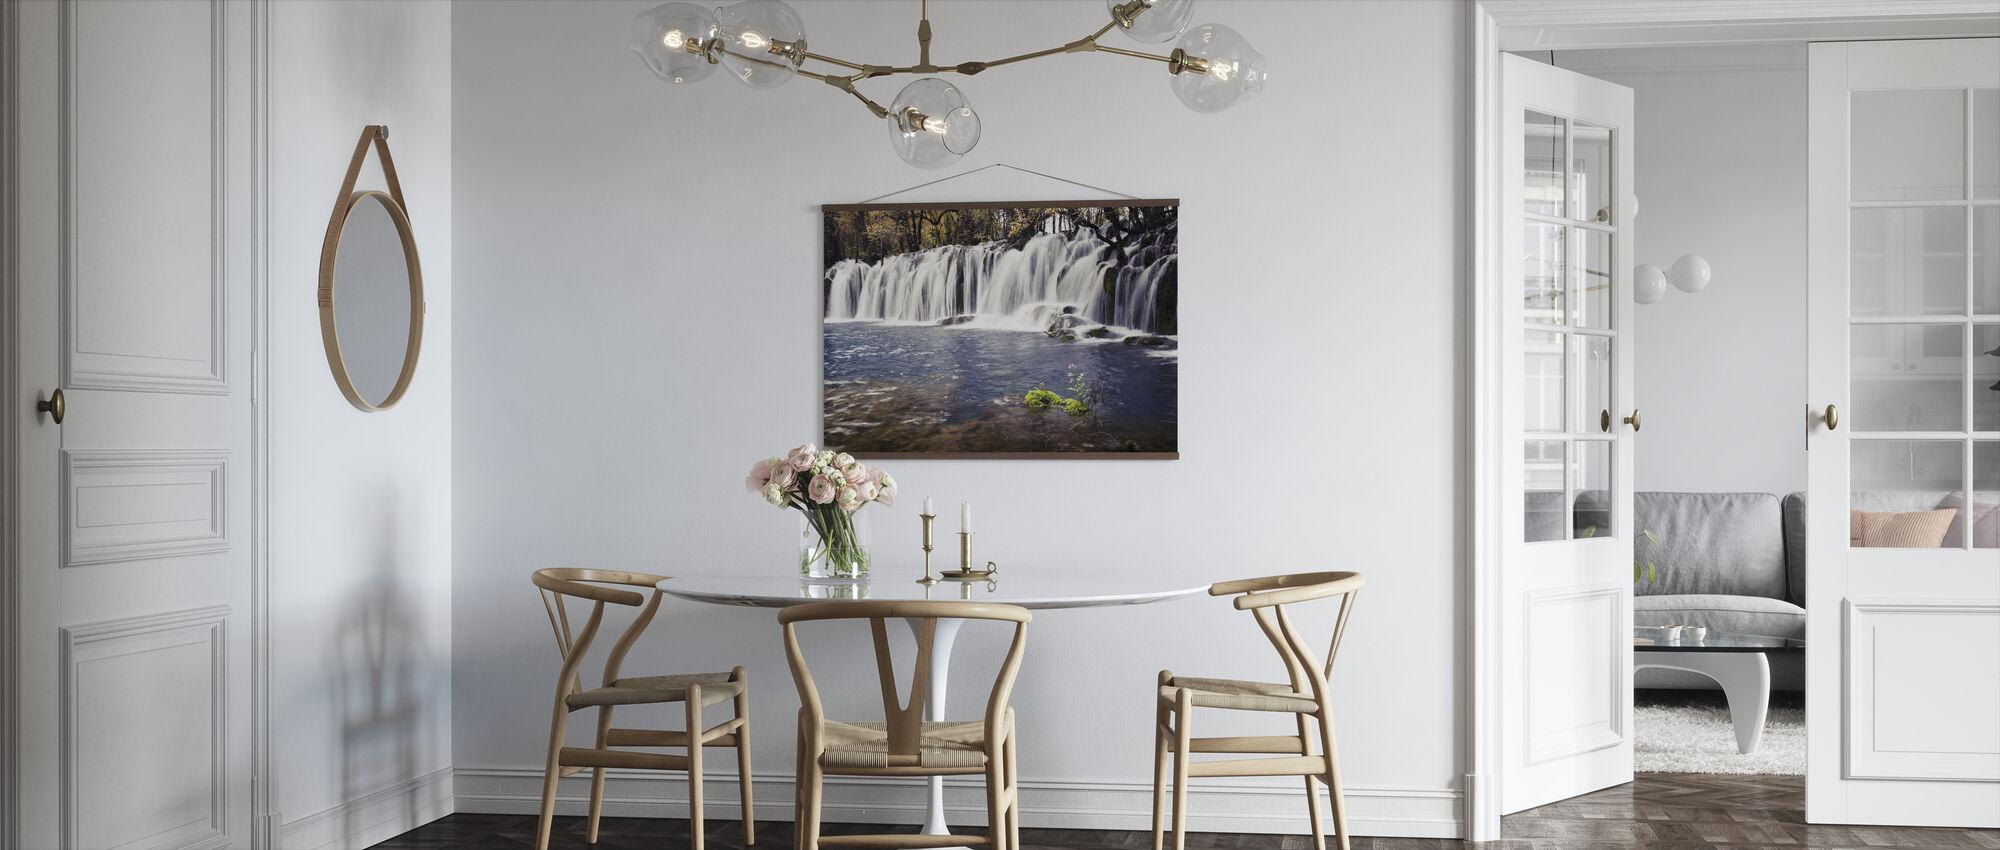 Water Afflux - Poster - Keuken